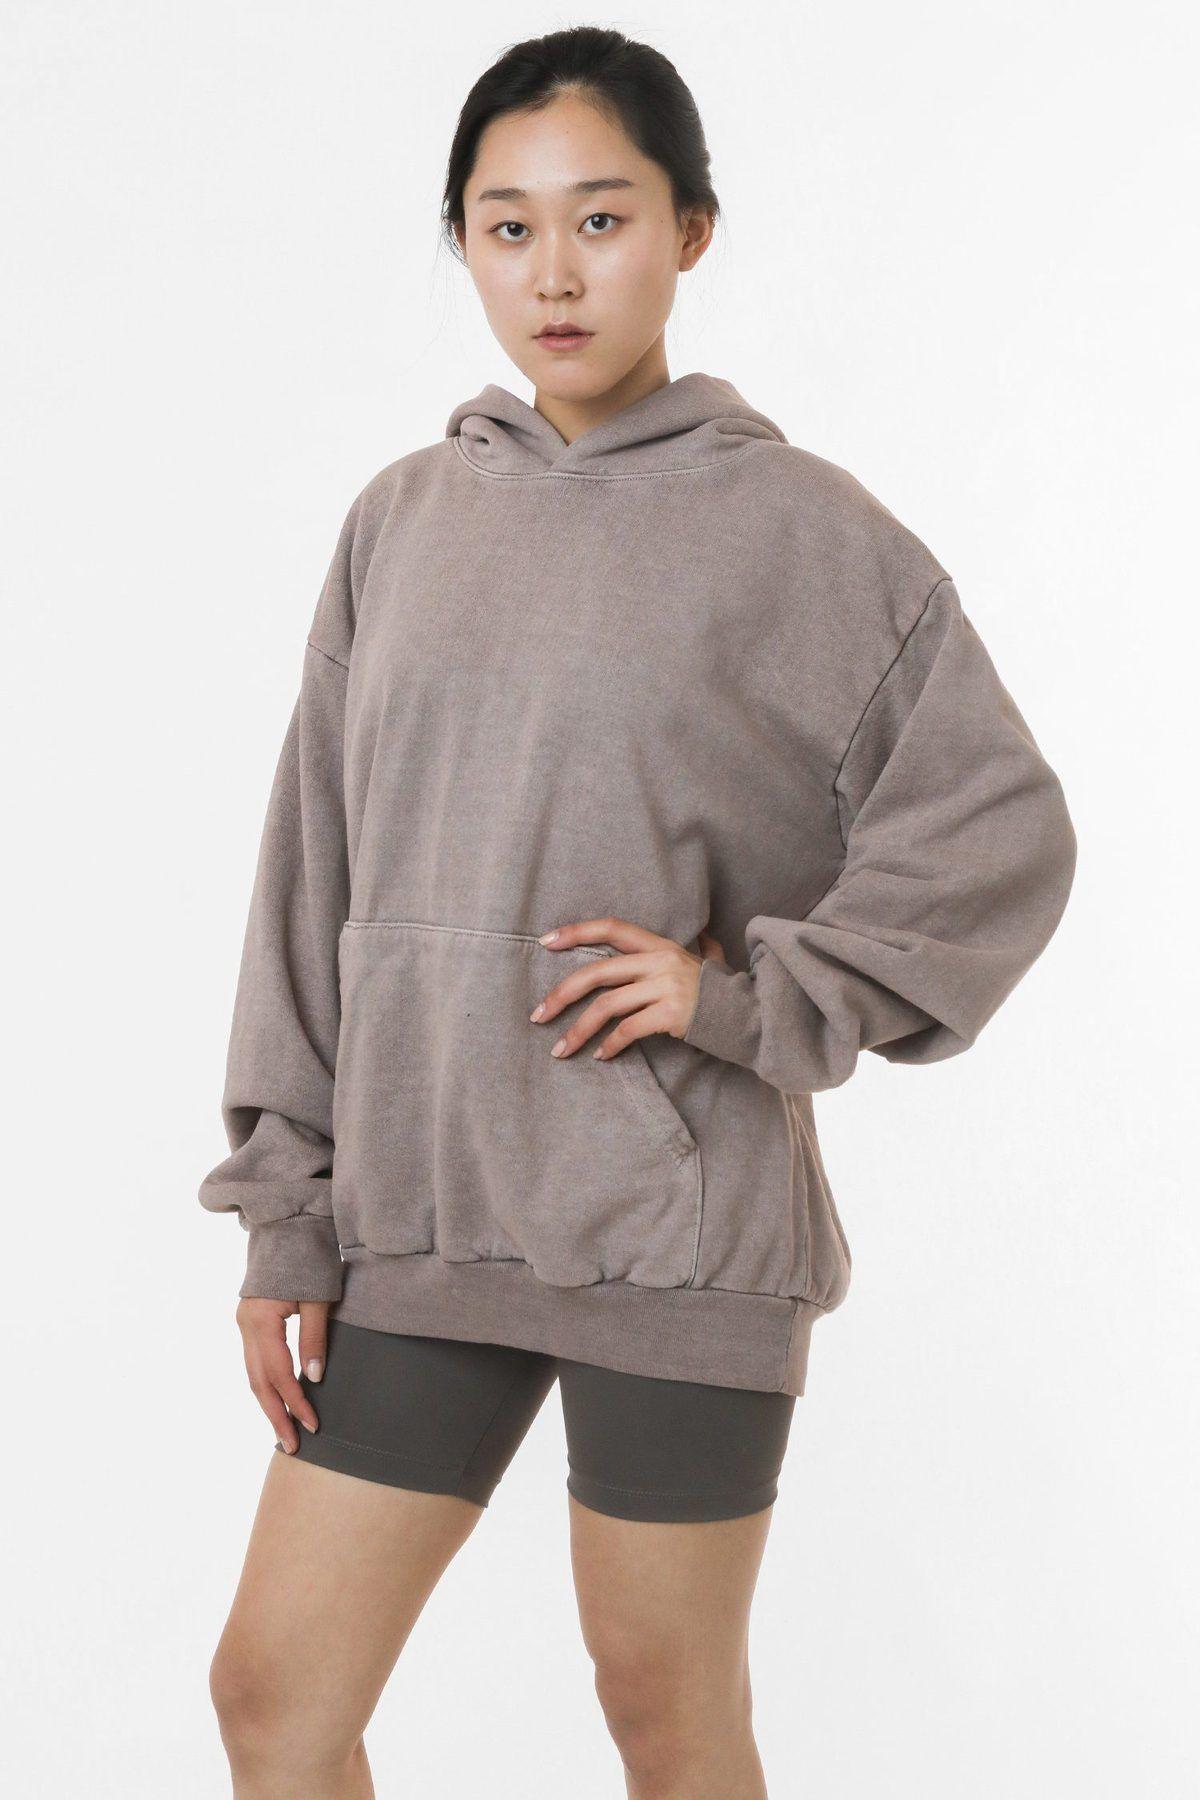 Hf09gd Unisex Pigment Dye 14oz Heavy Fleece Hooded Pullover Sweatshirt In 2020 Hooded Pullover Sweatshirts Fleece Hooded Sweatshirt